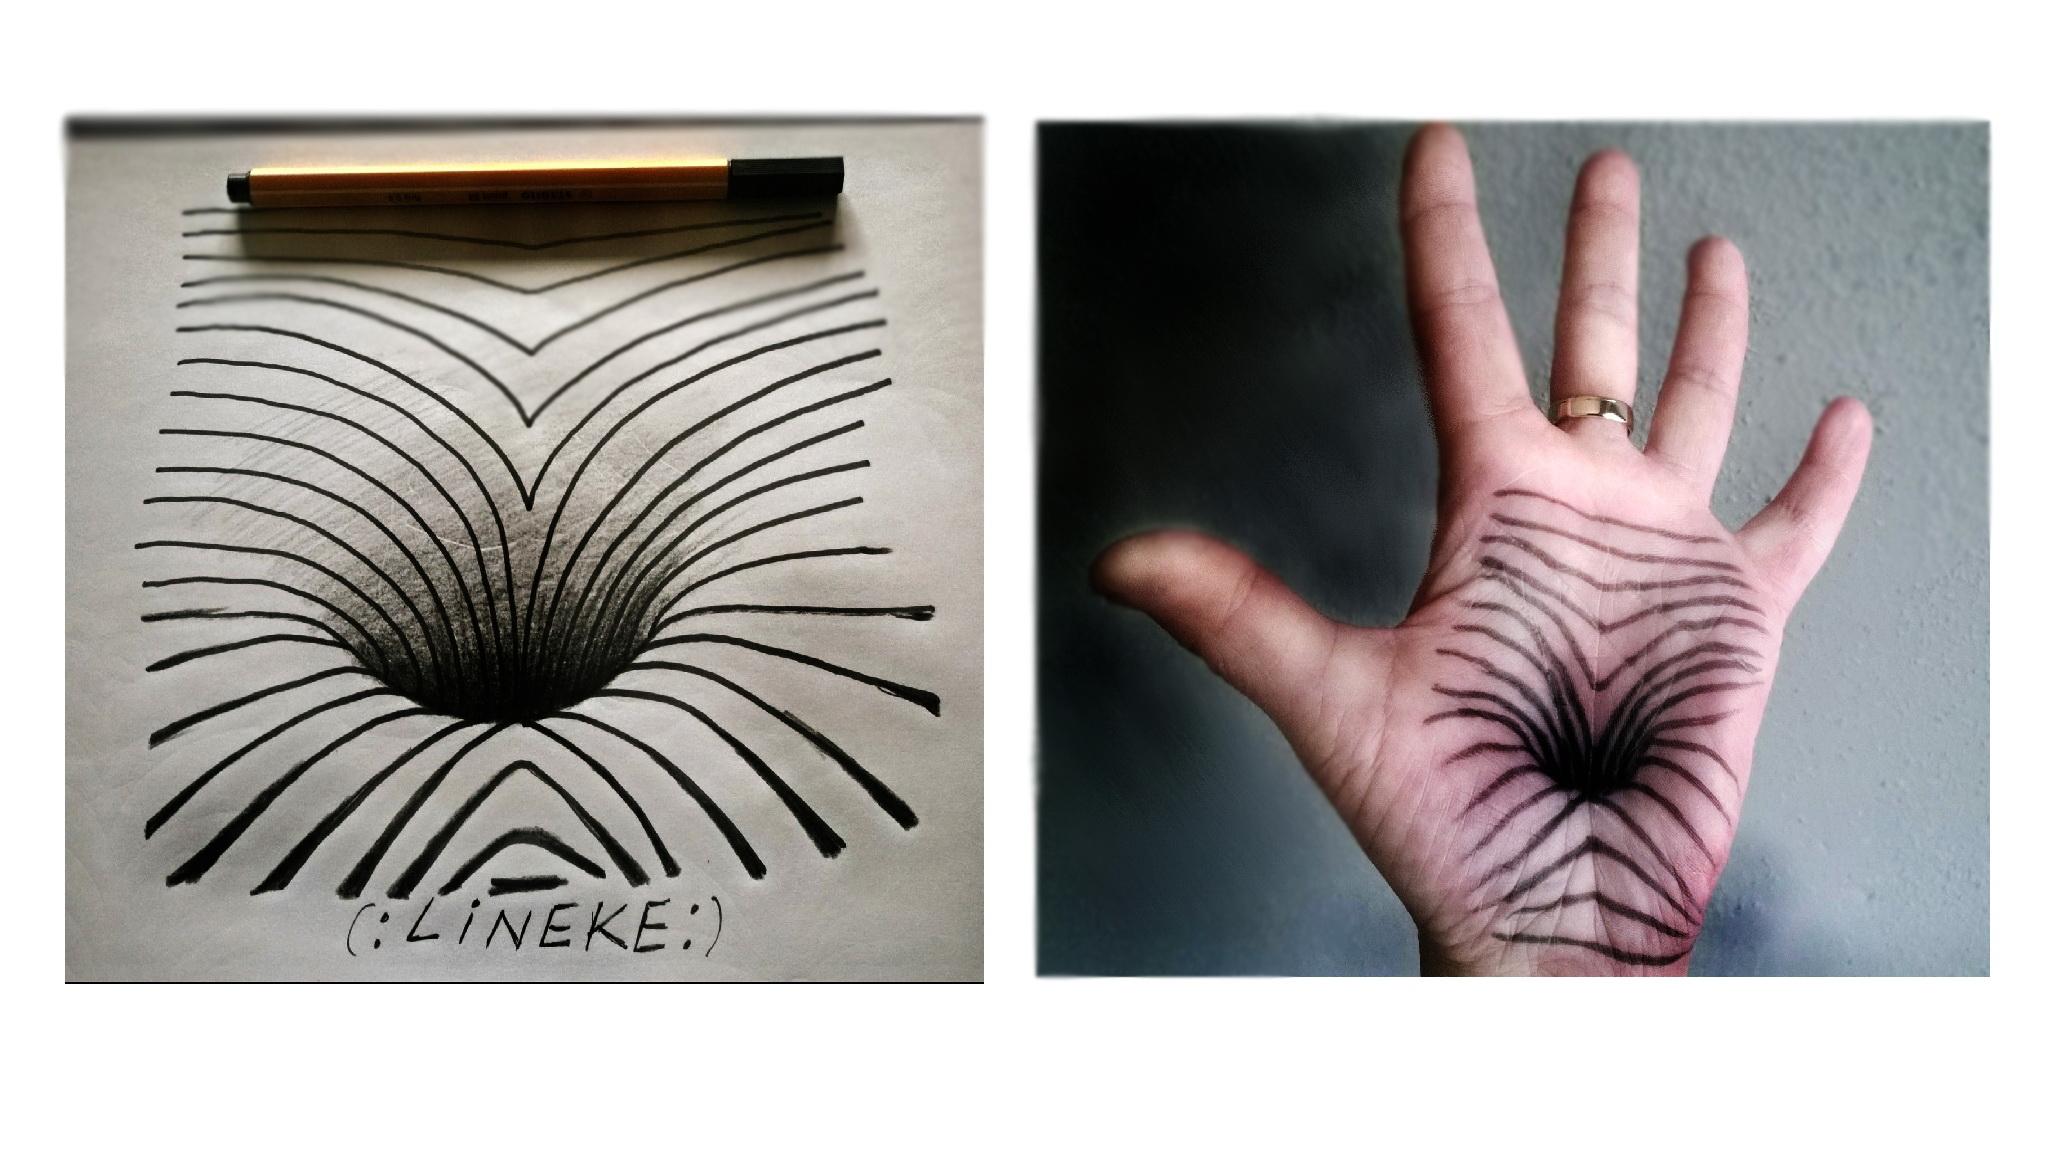 Drawn optical illusion hole On :) in illusion DeviantArt